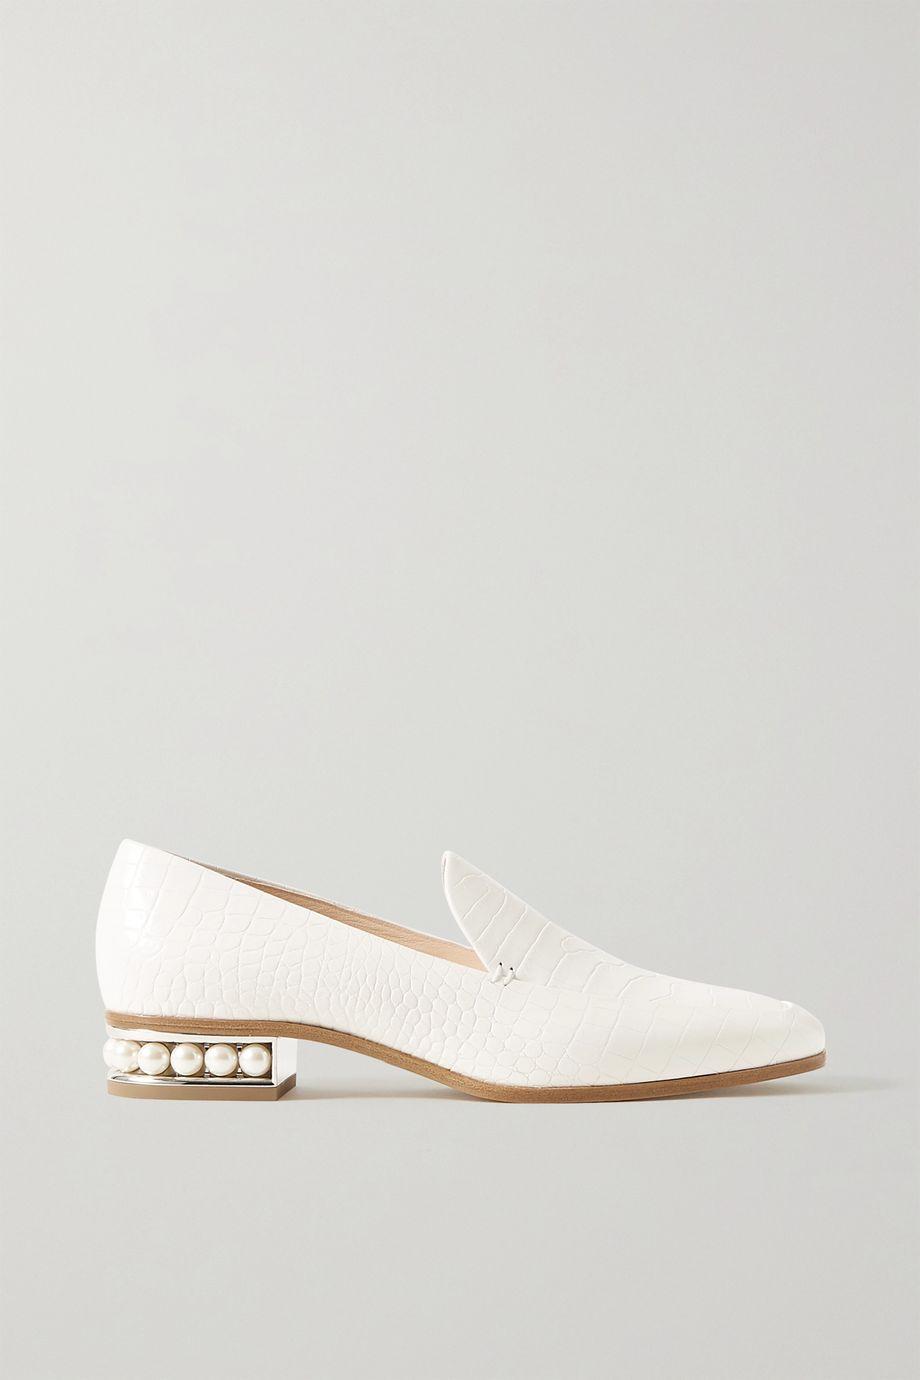 Nicholas Kirkwood Casati faux pearl-embellished croc-effect leather loafers